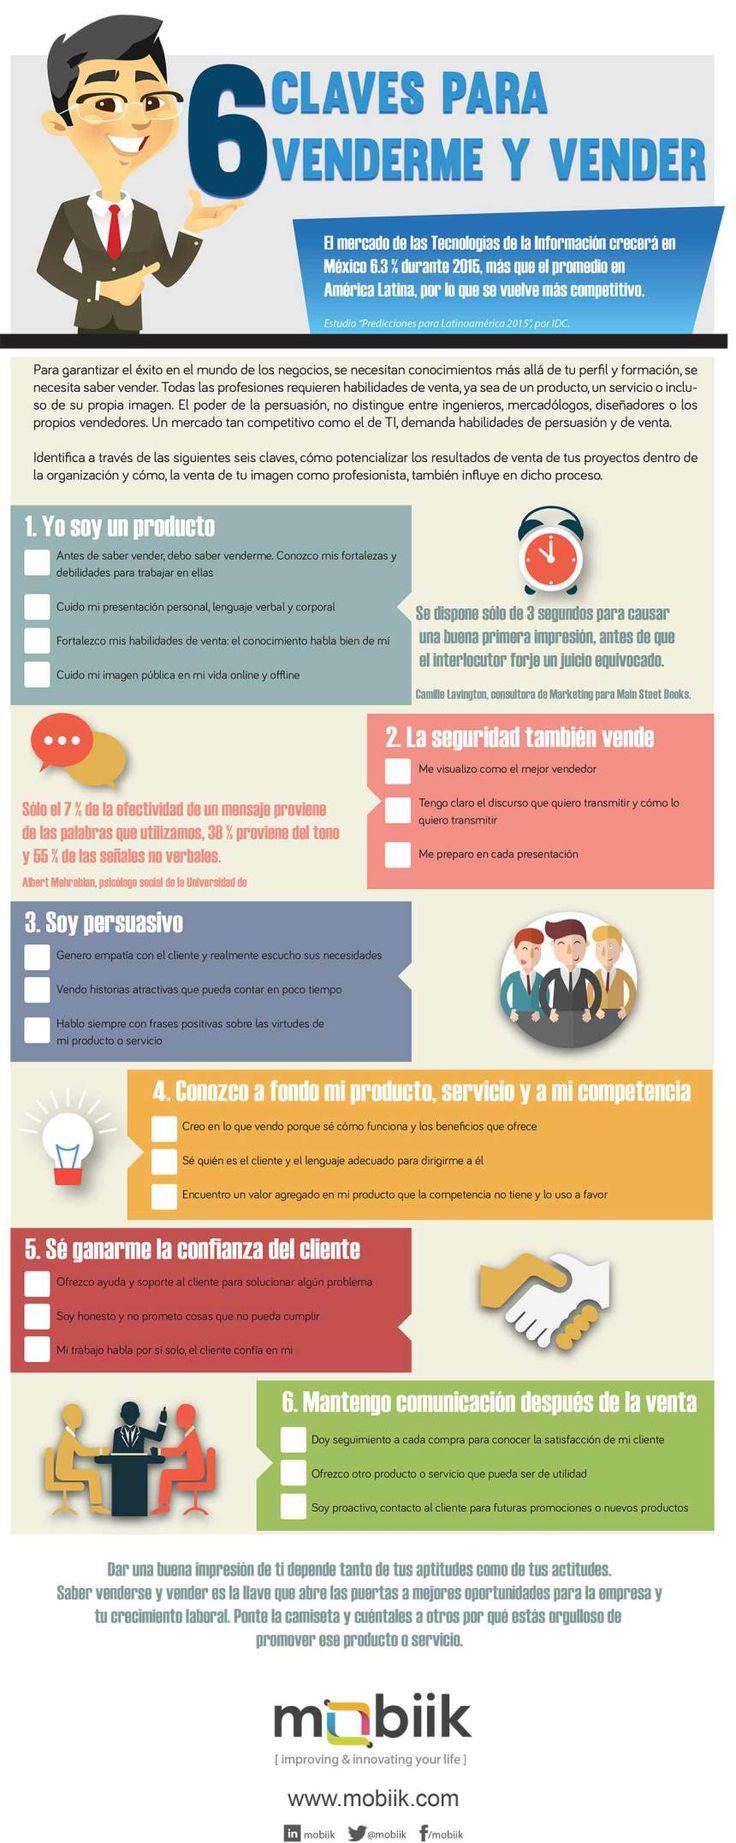 6 claves para venderme y vender #infografia #infographic #marketing